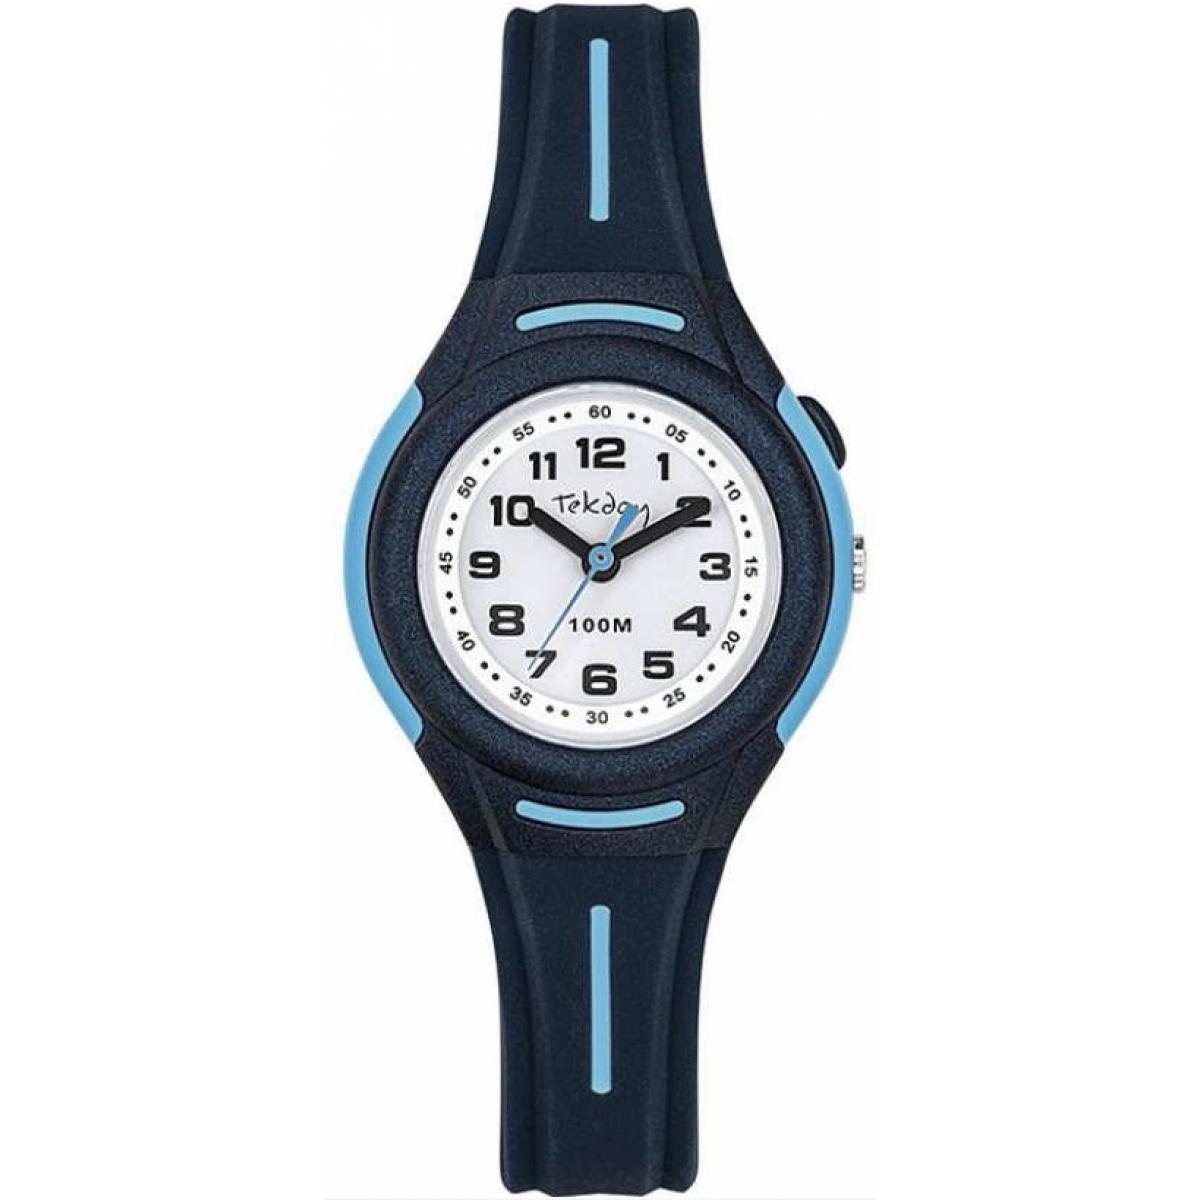 Montre 654673 - Montre Boîtier Silicone Bleu Bracelet Silicone Bleu - Tekday - Modalova